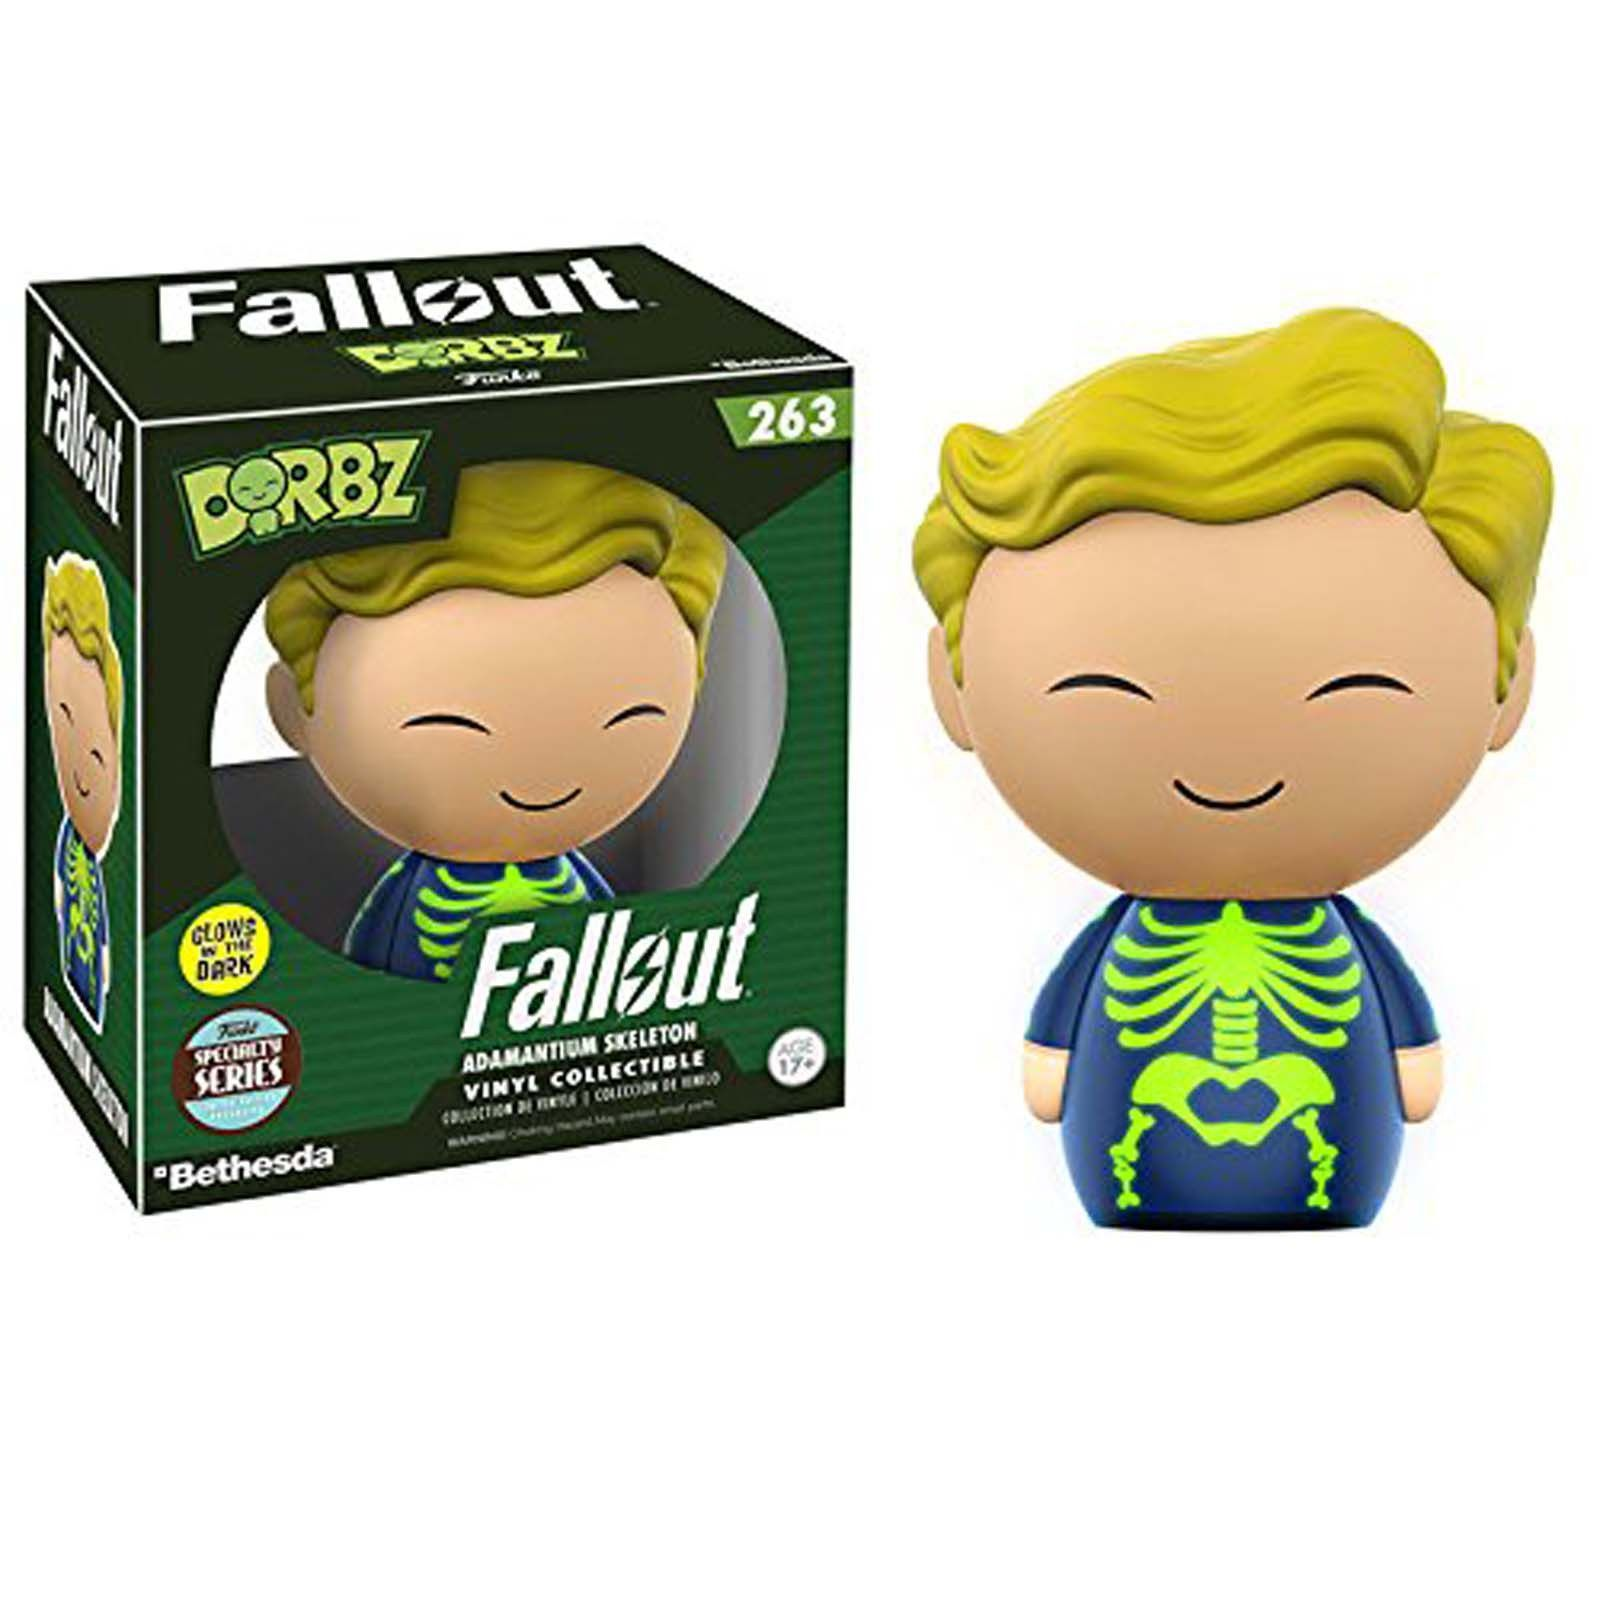 Funko Fallout Specialty Series Dorbz Adamantium Skeleton Vinyl Figure IN STOCK